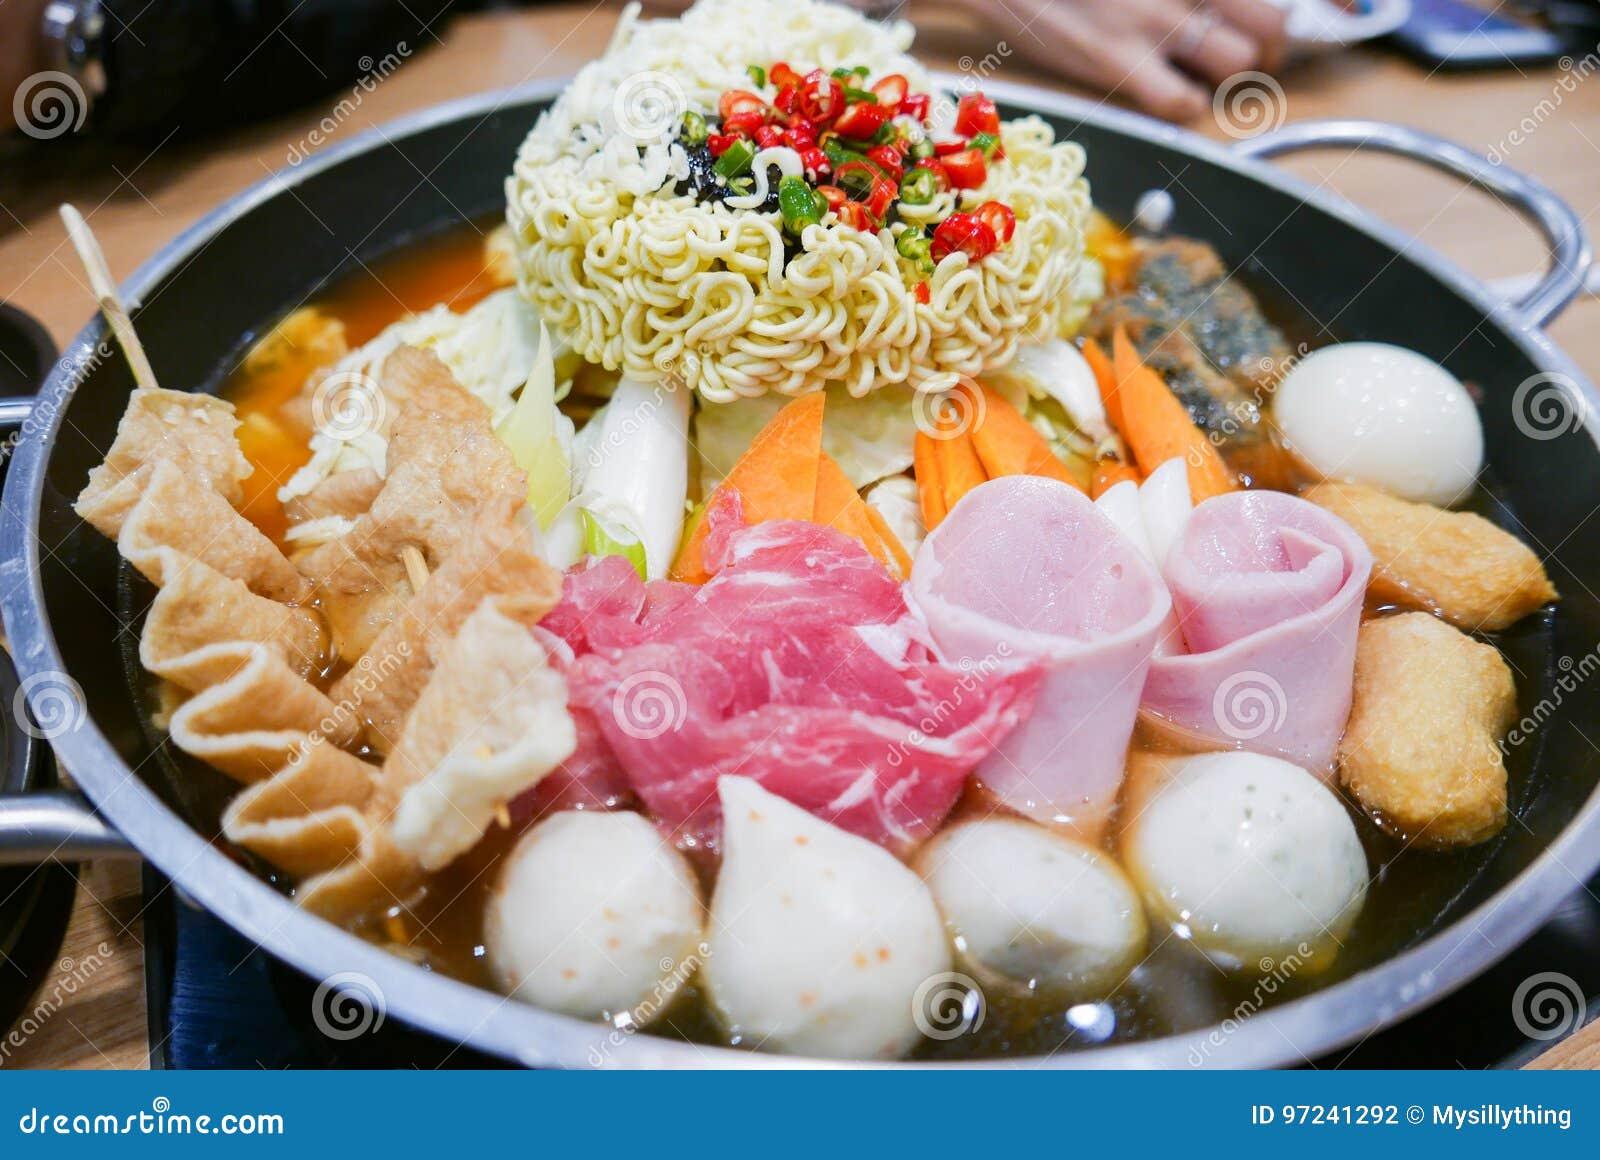 Korean Hot pot `Budae Jjigae` or Army Stew, a Korean fusion foo